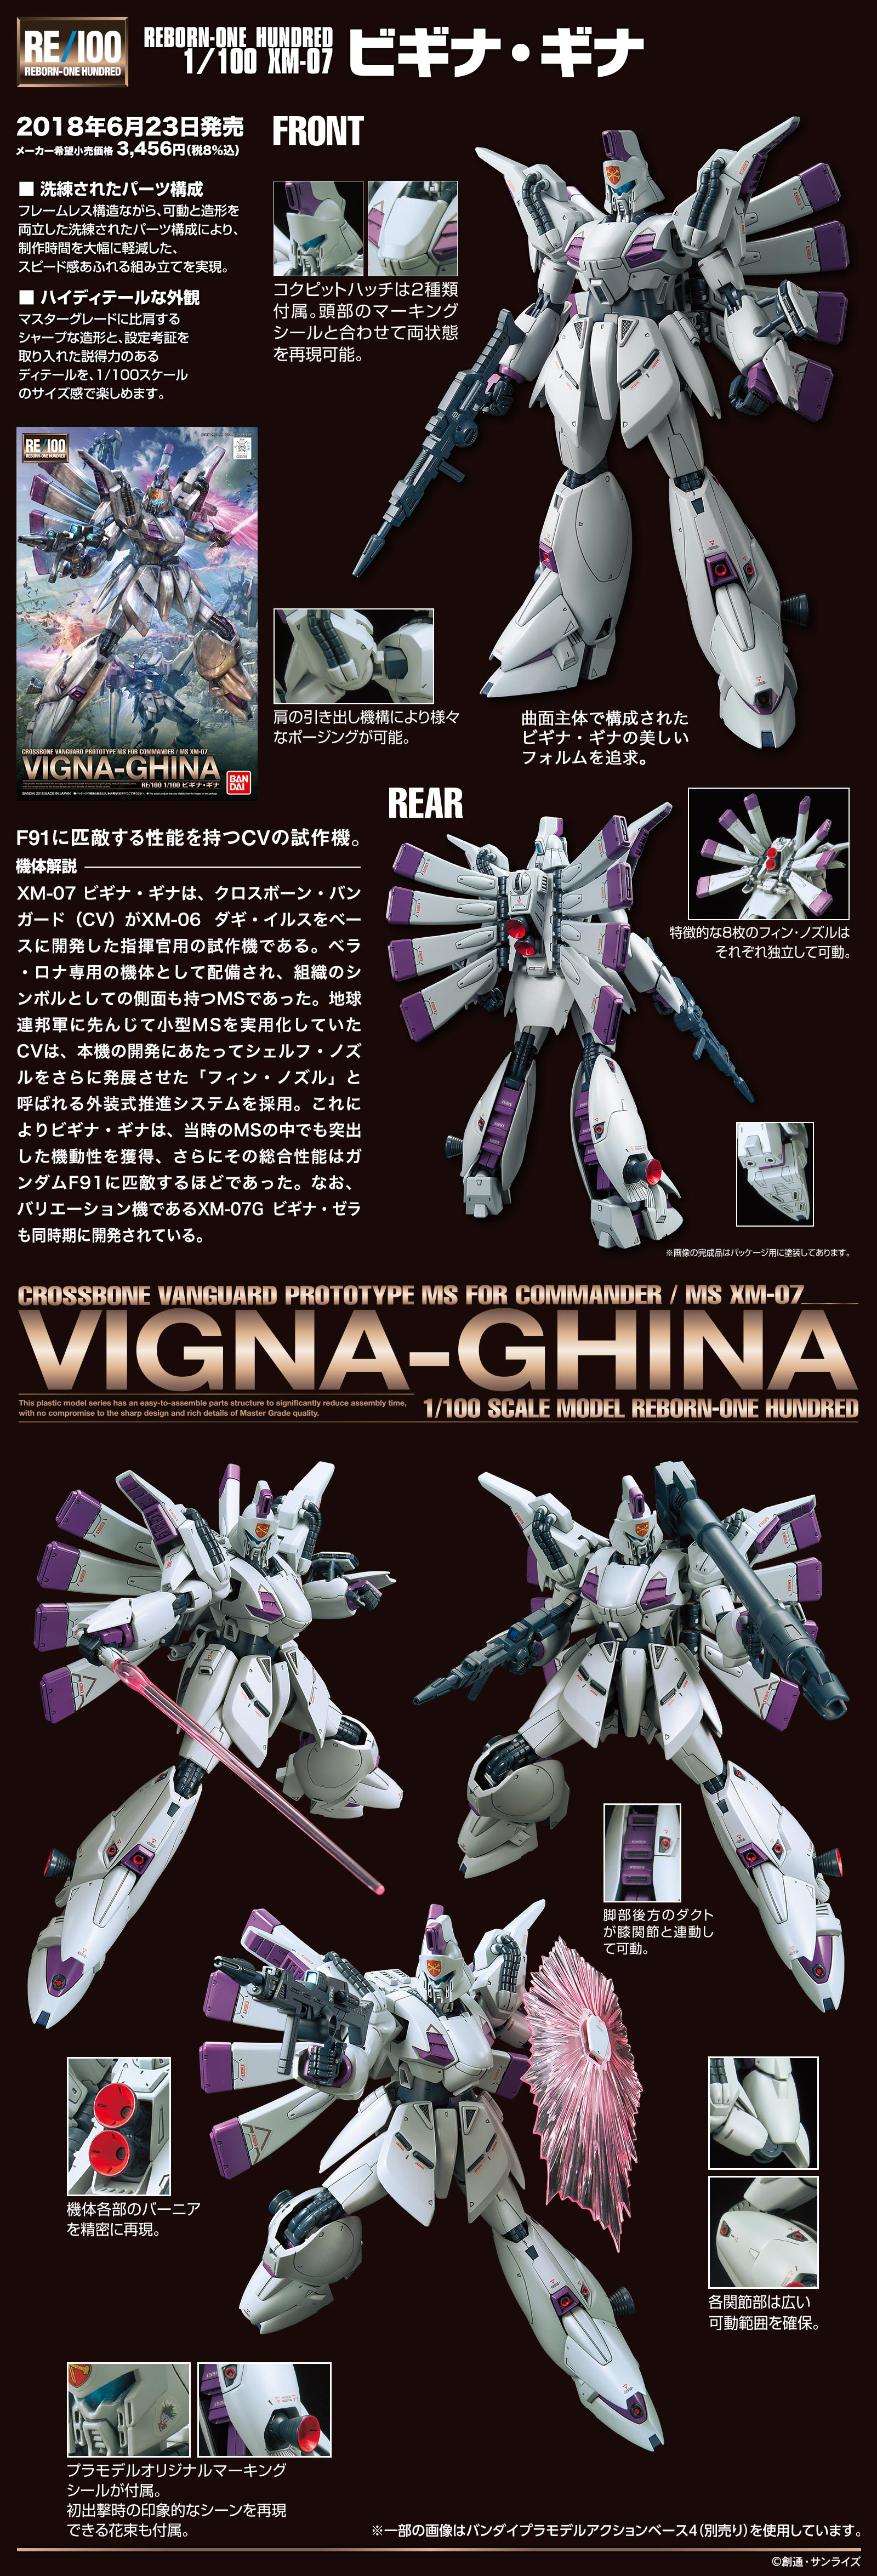 RE/100 1/100 ビギナ・ギナ [Vigna-Ghina] 公式商品説明(画像)